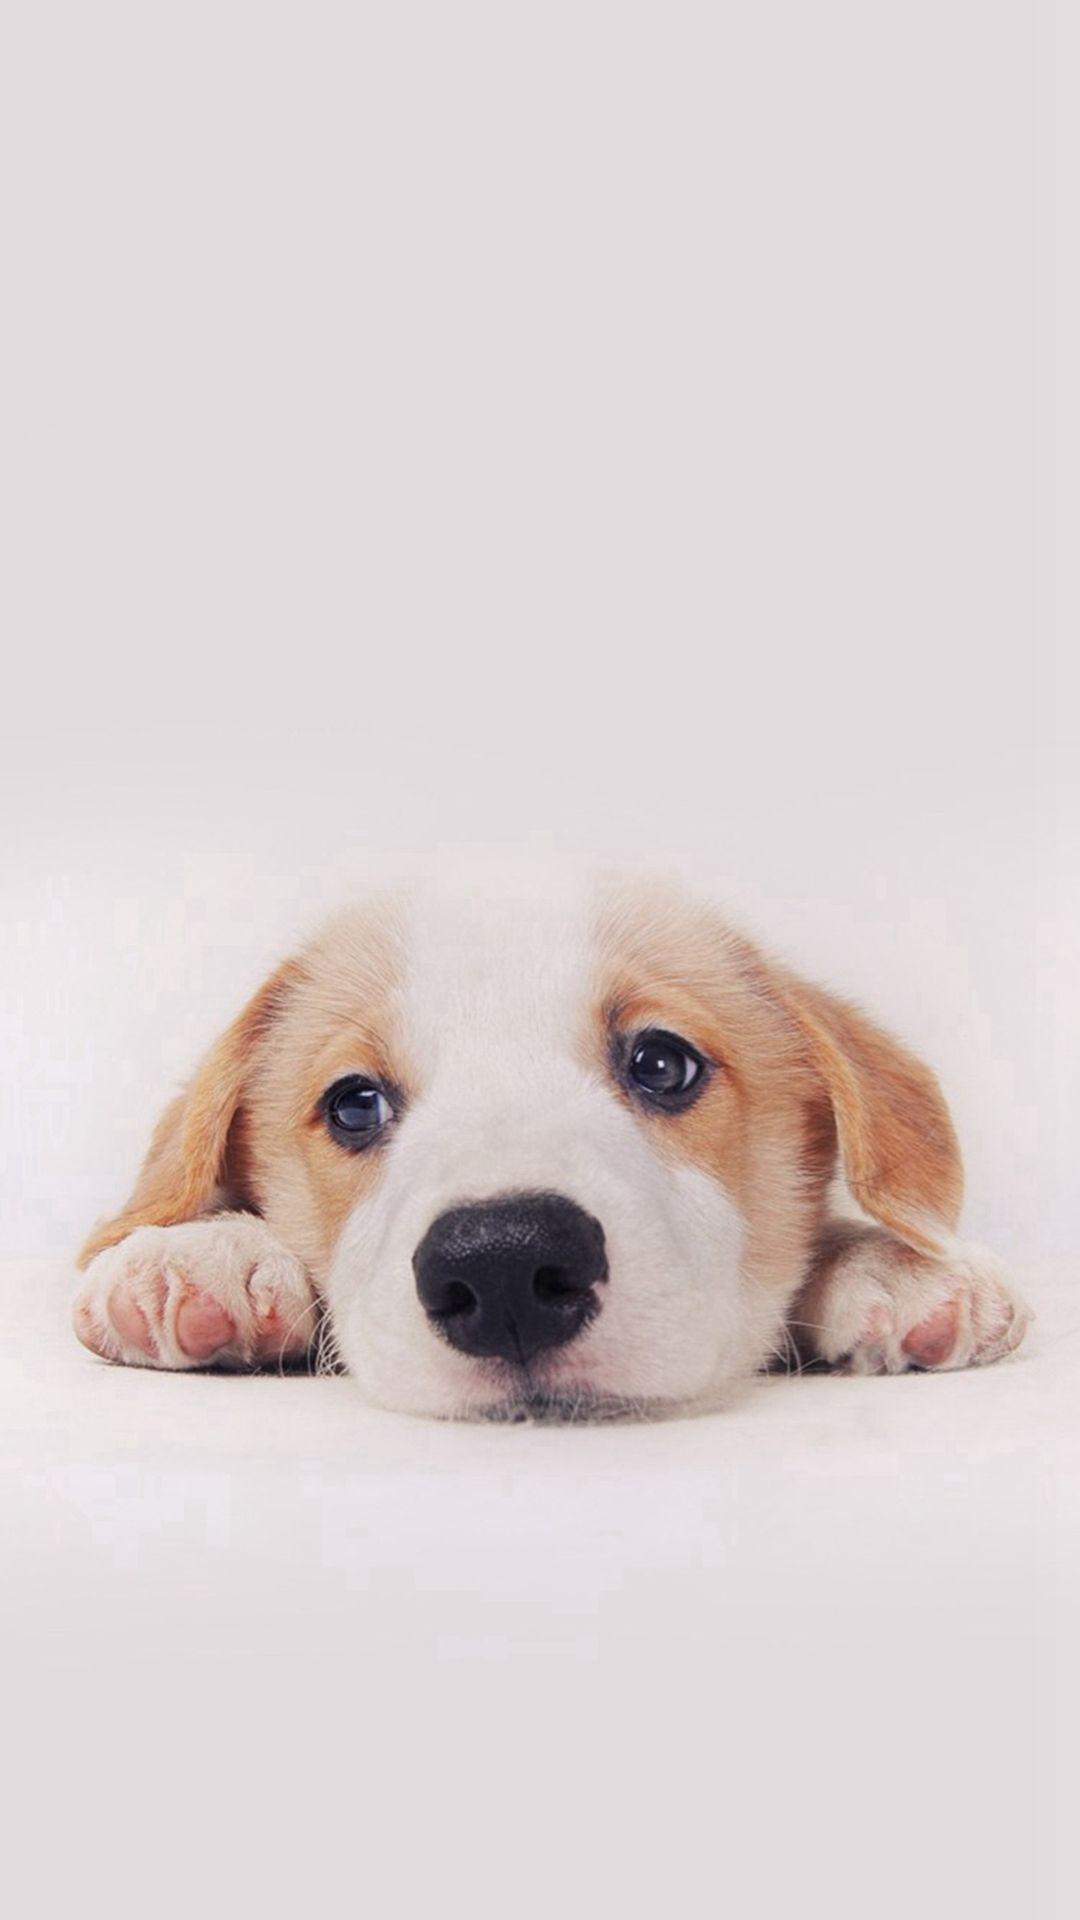 Cute dog wallpaper Dog background Dog 1080x1920